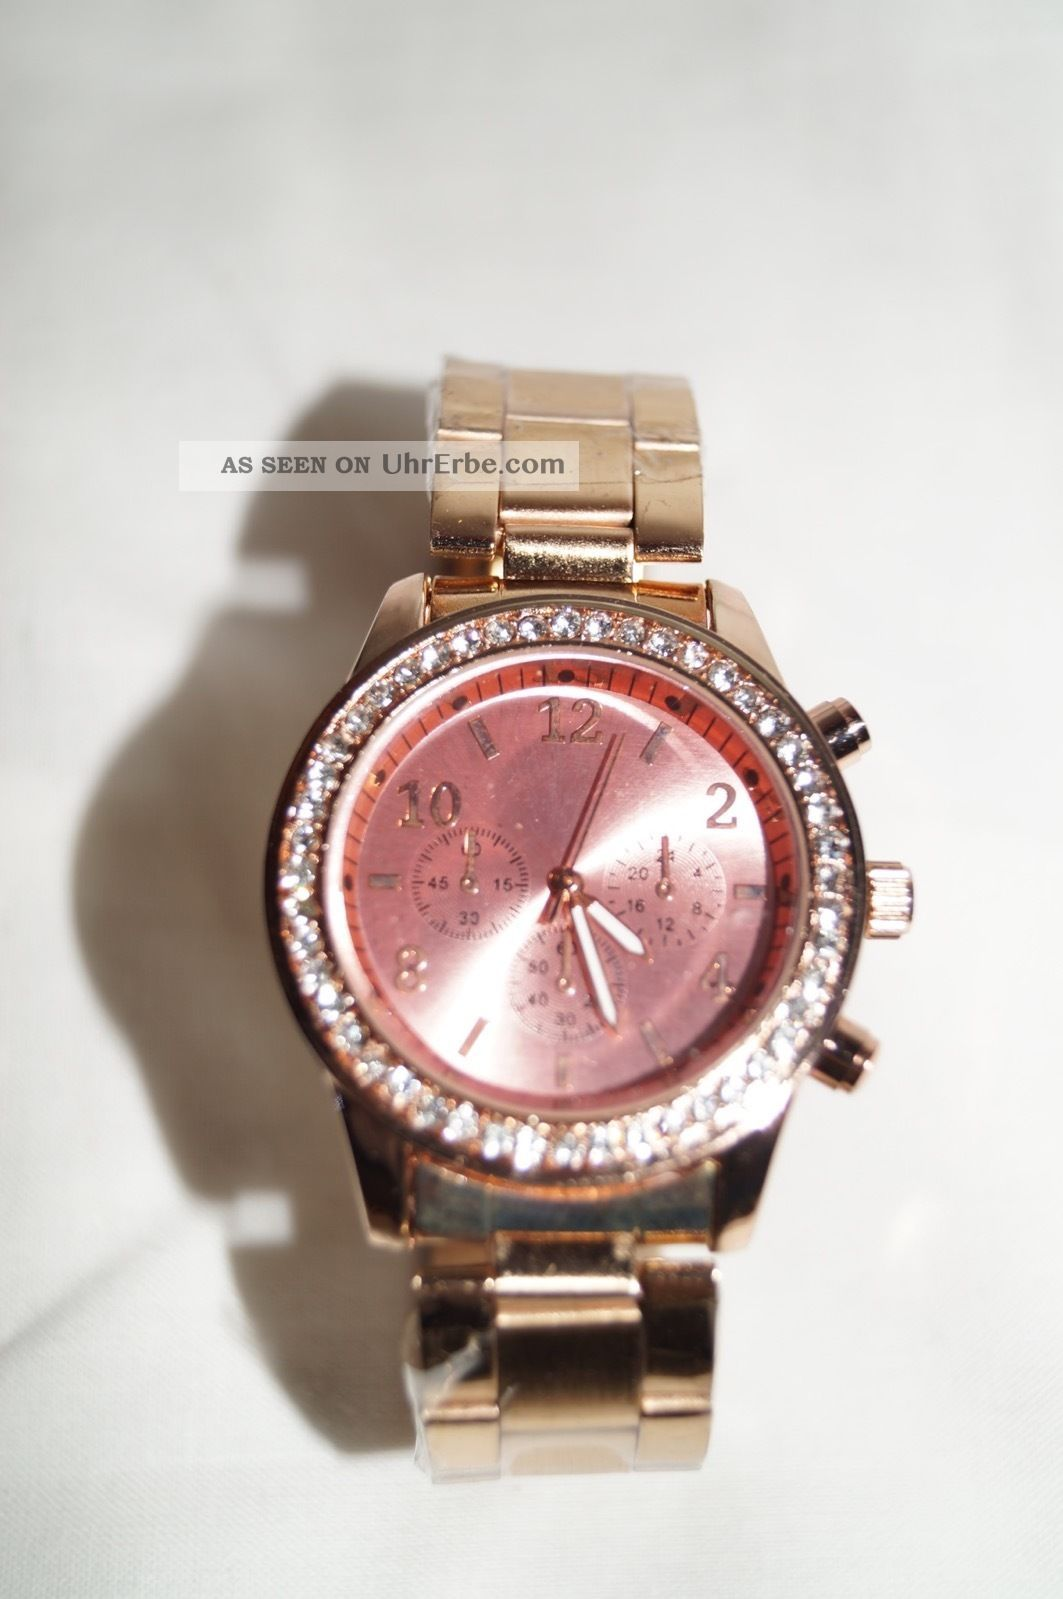 Damenuhr Armbanduhr Uhr Edelstahl Strass Rotgold Rose Rosegold Vergoldet Blogger Armbanduhren Bild